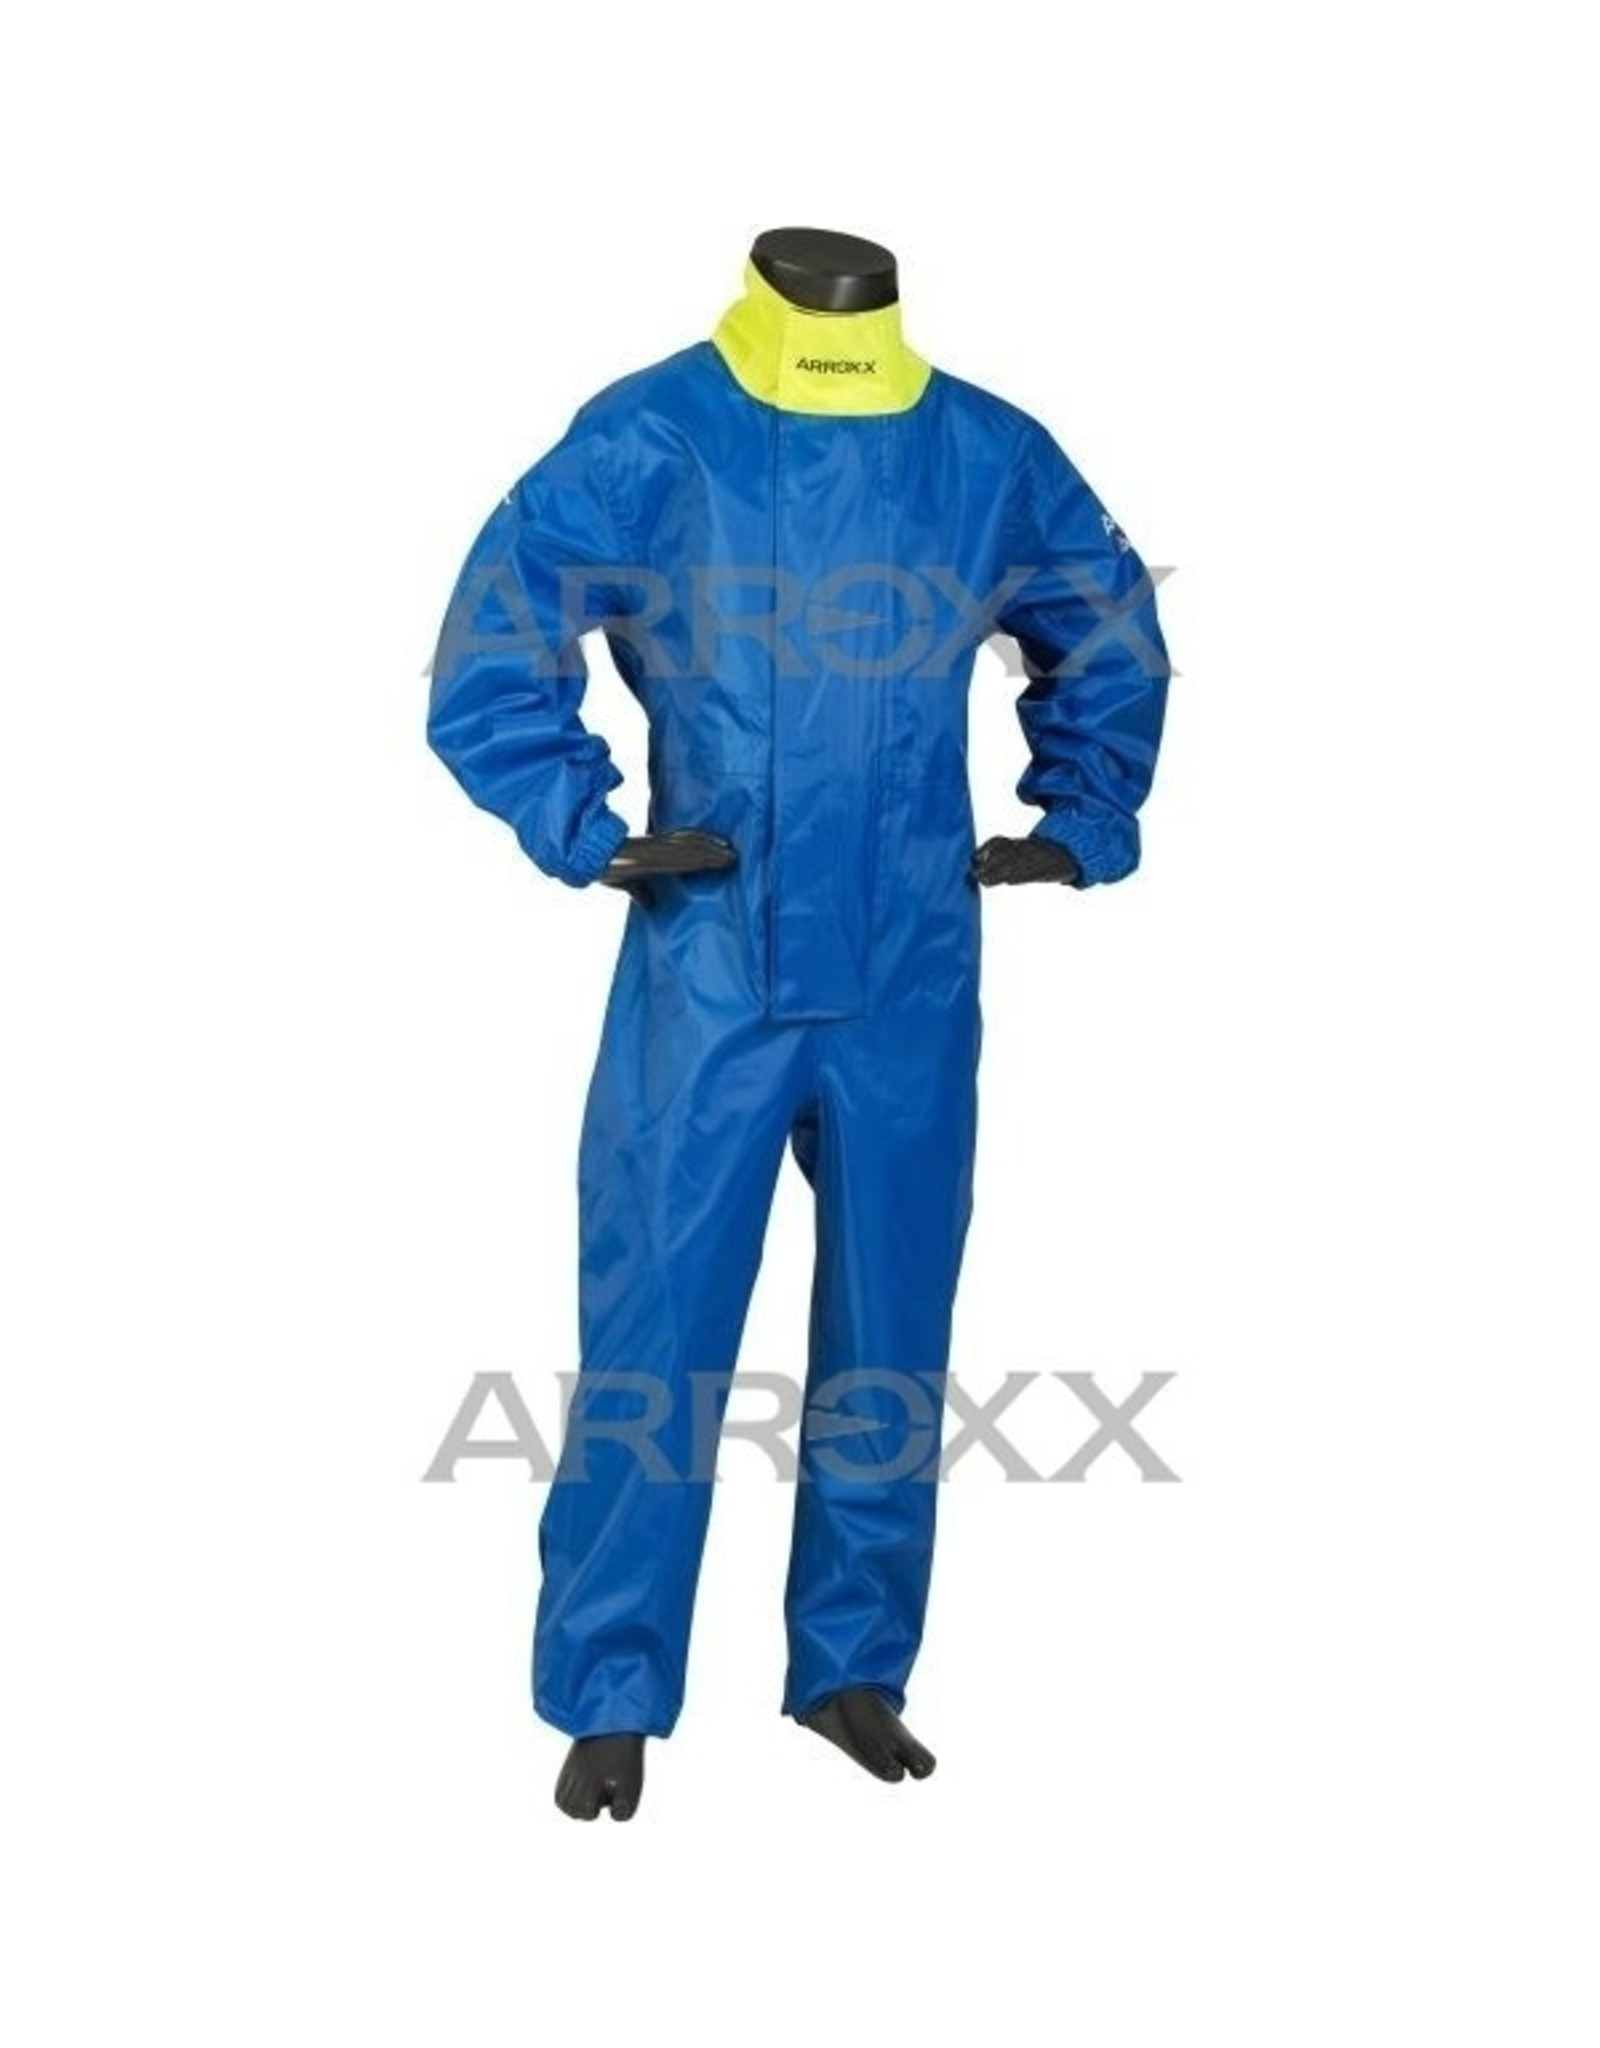 Arroxx Arroxx regenoverall Xbase  Blauw